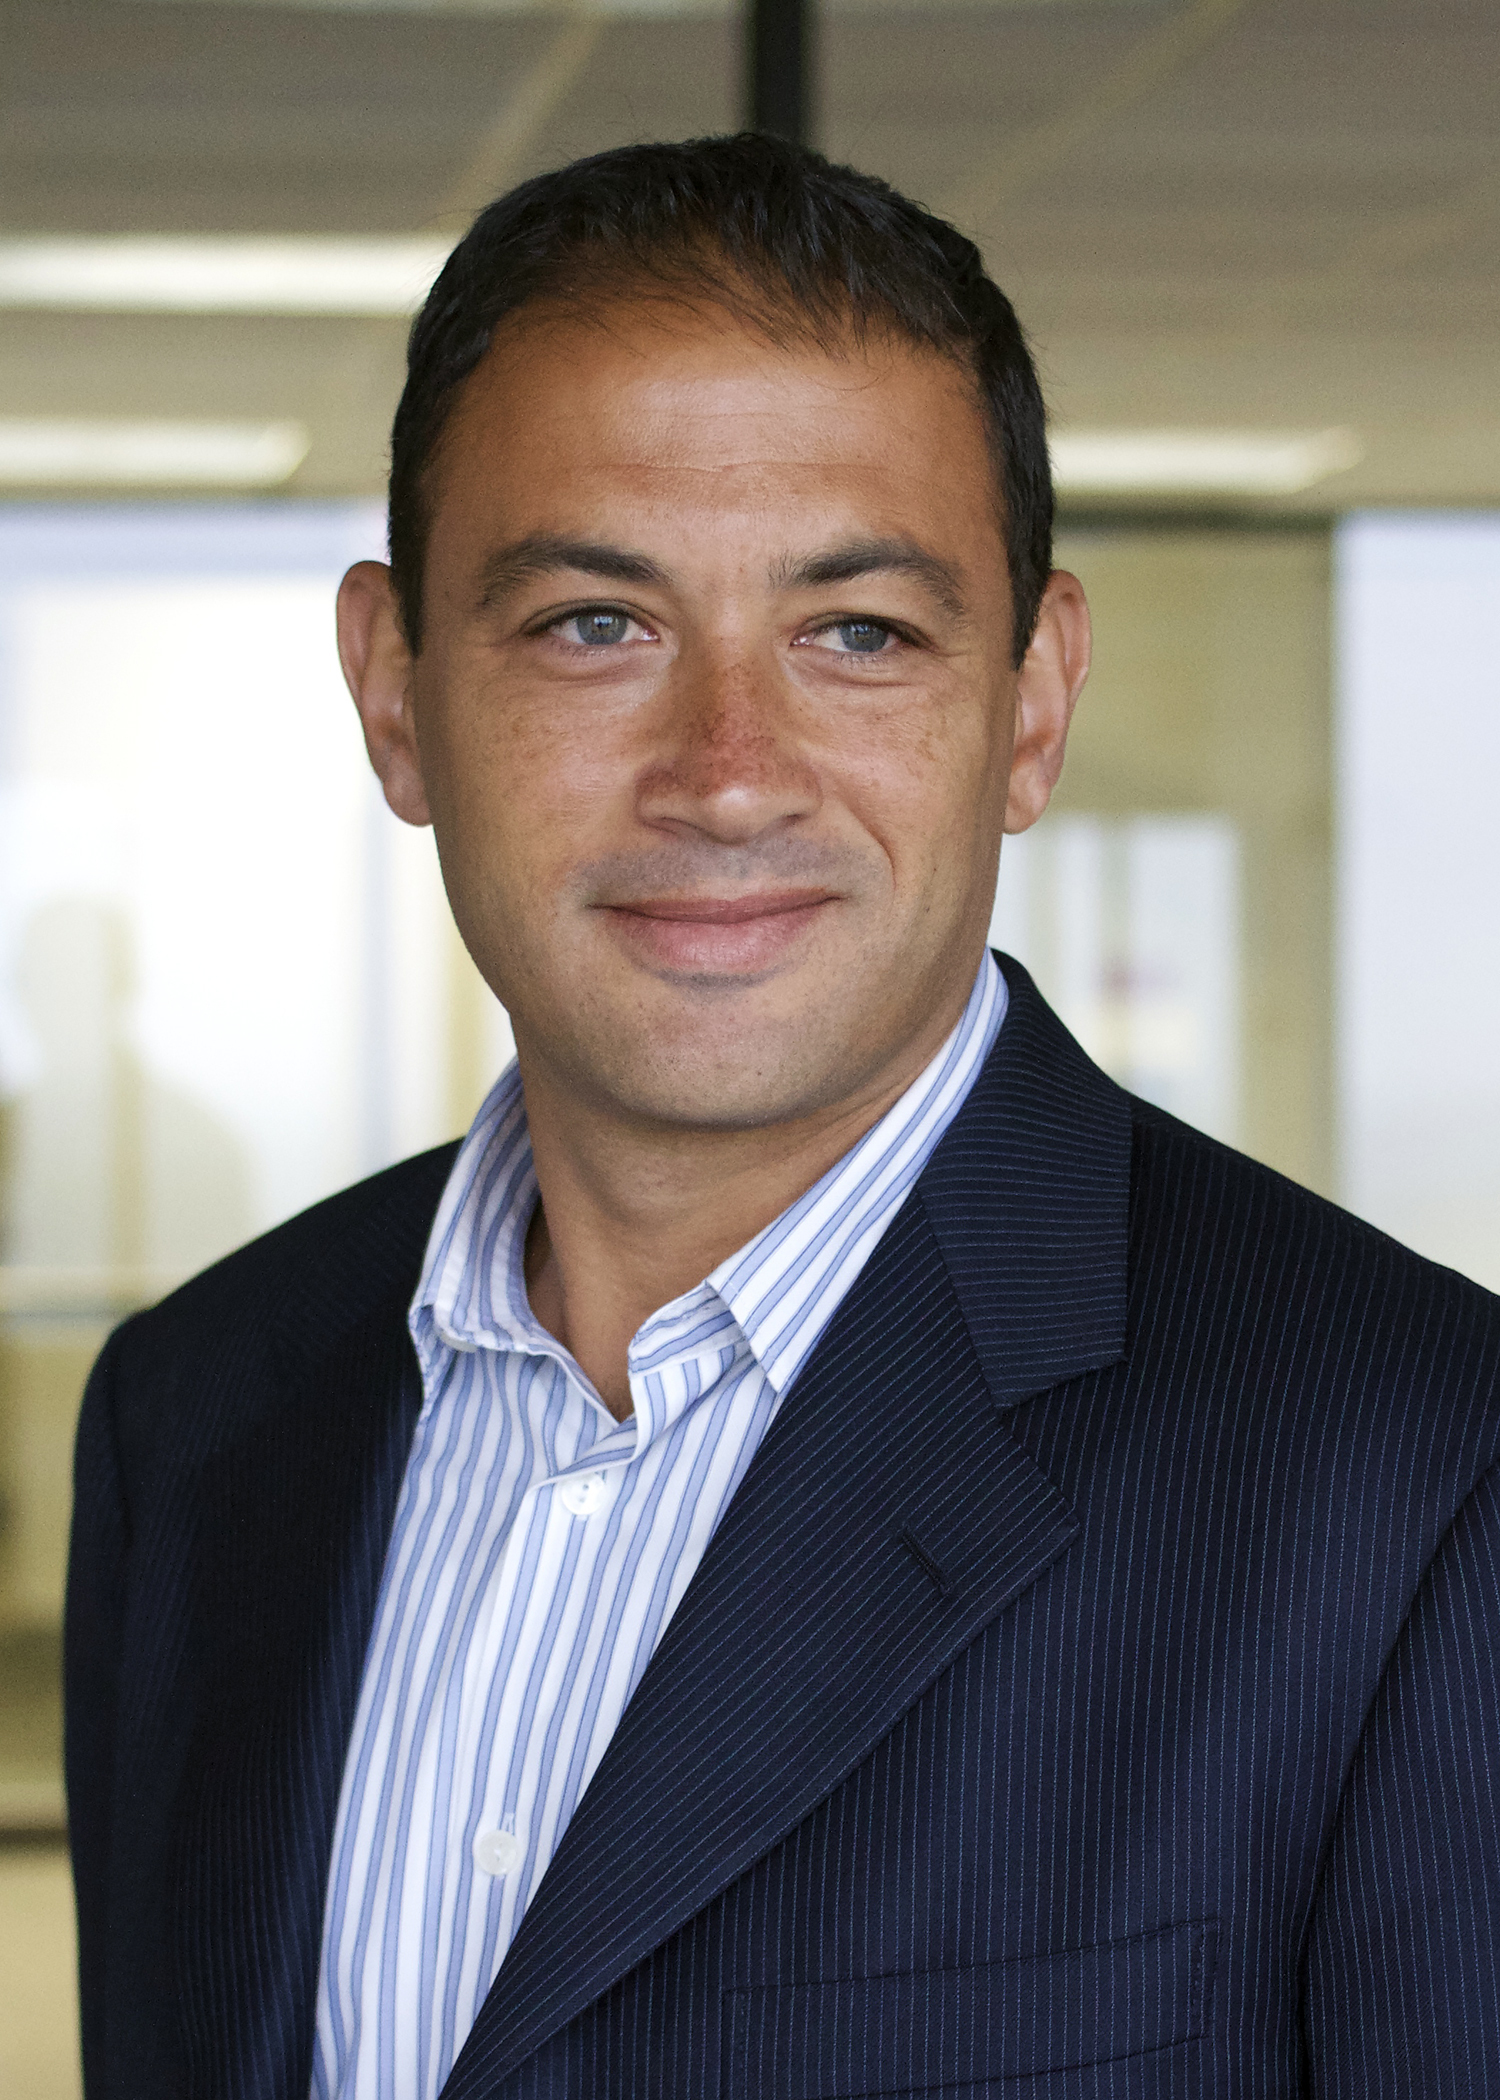 Amir Rizkalla, ChannelNet senior director of account management for the western U.S. region (Photo: Business Wire)